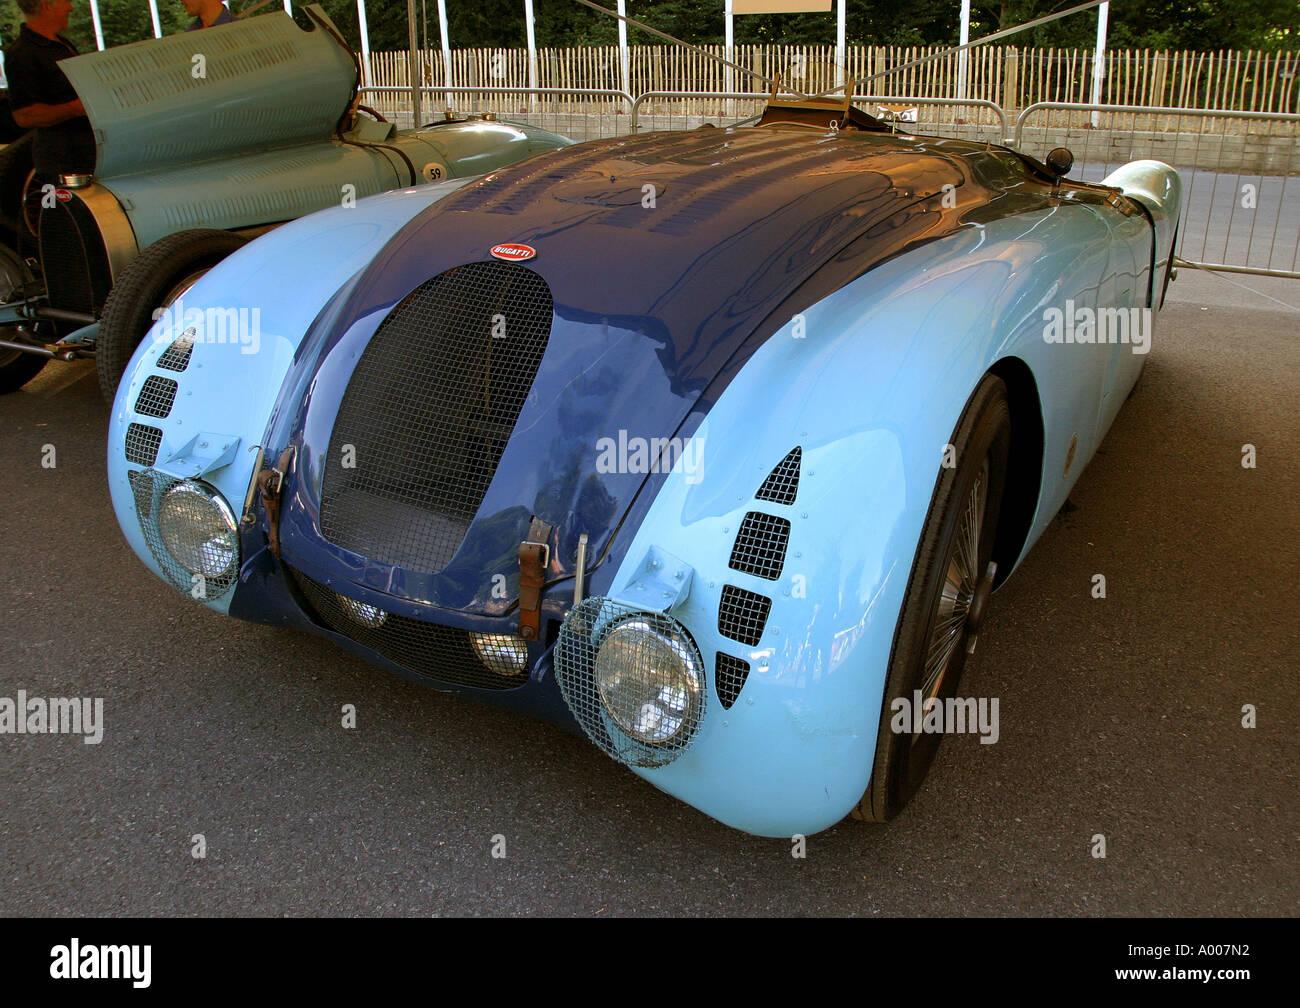 1936 Bugatti Type 57G Tank at Goodwood Festival of Speed Stock Photo: 5621137 - Alamy